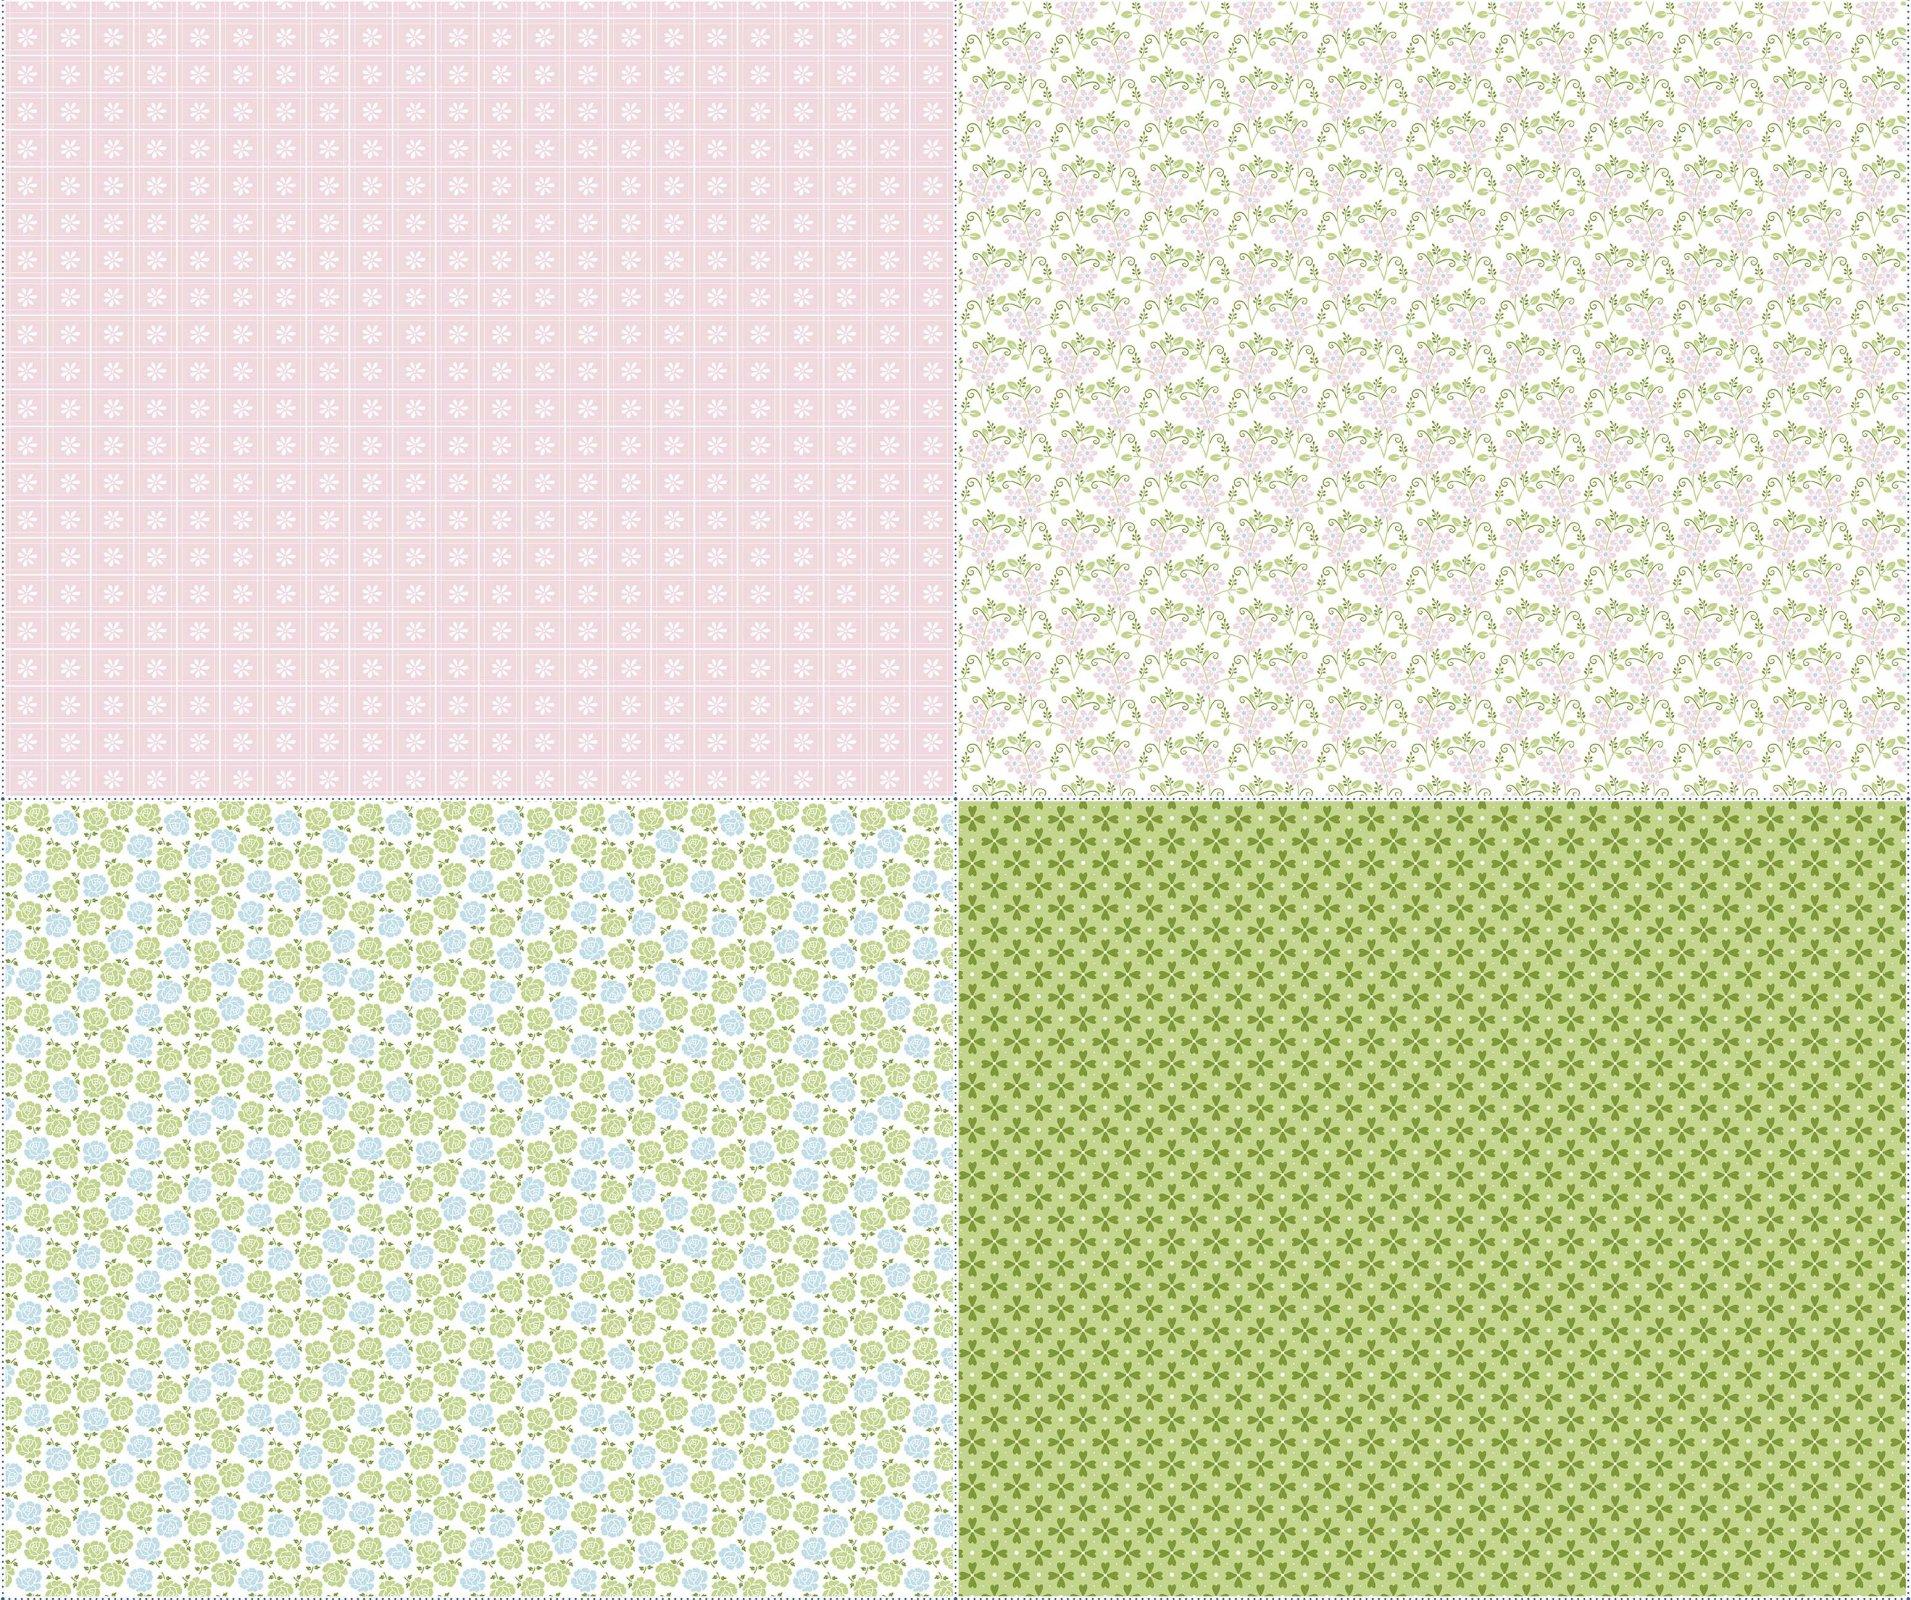 Sew Cherry 2 FQP5809-PINK